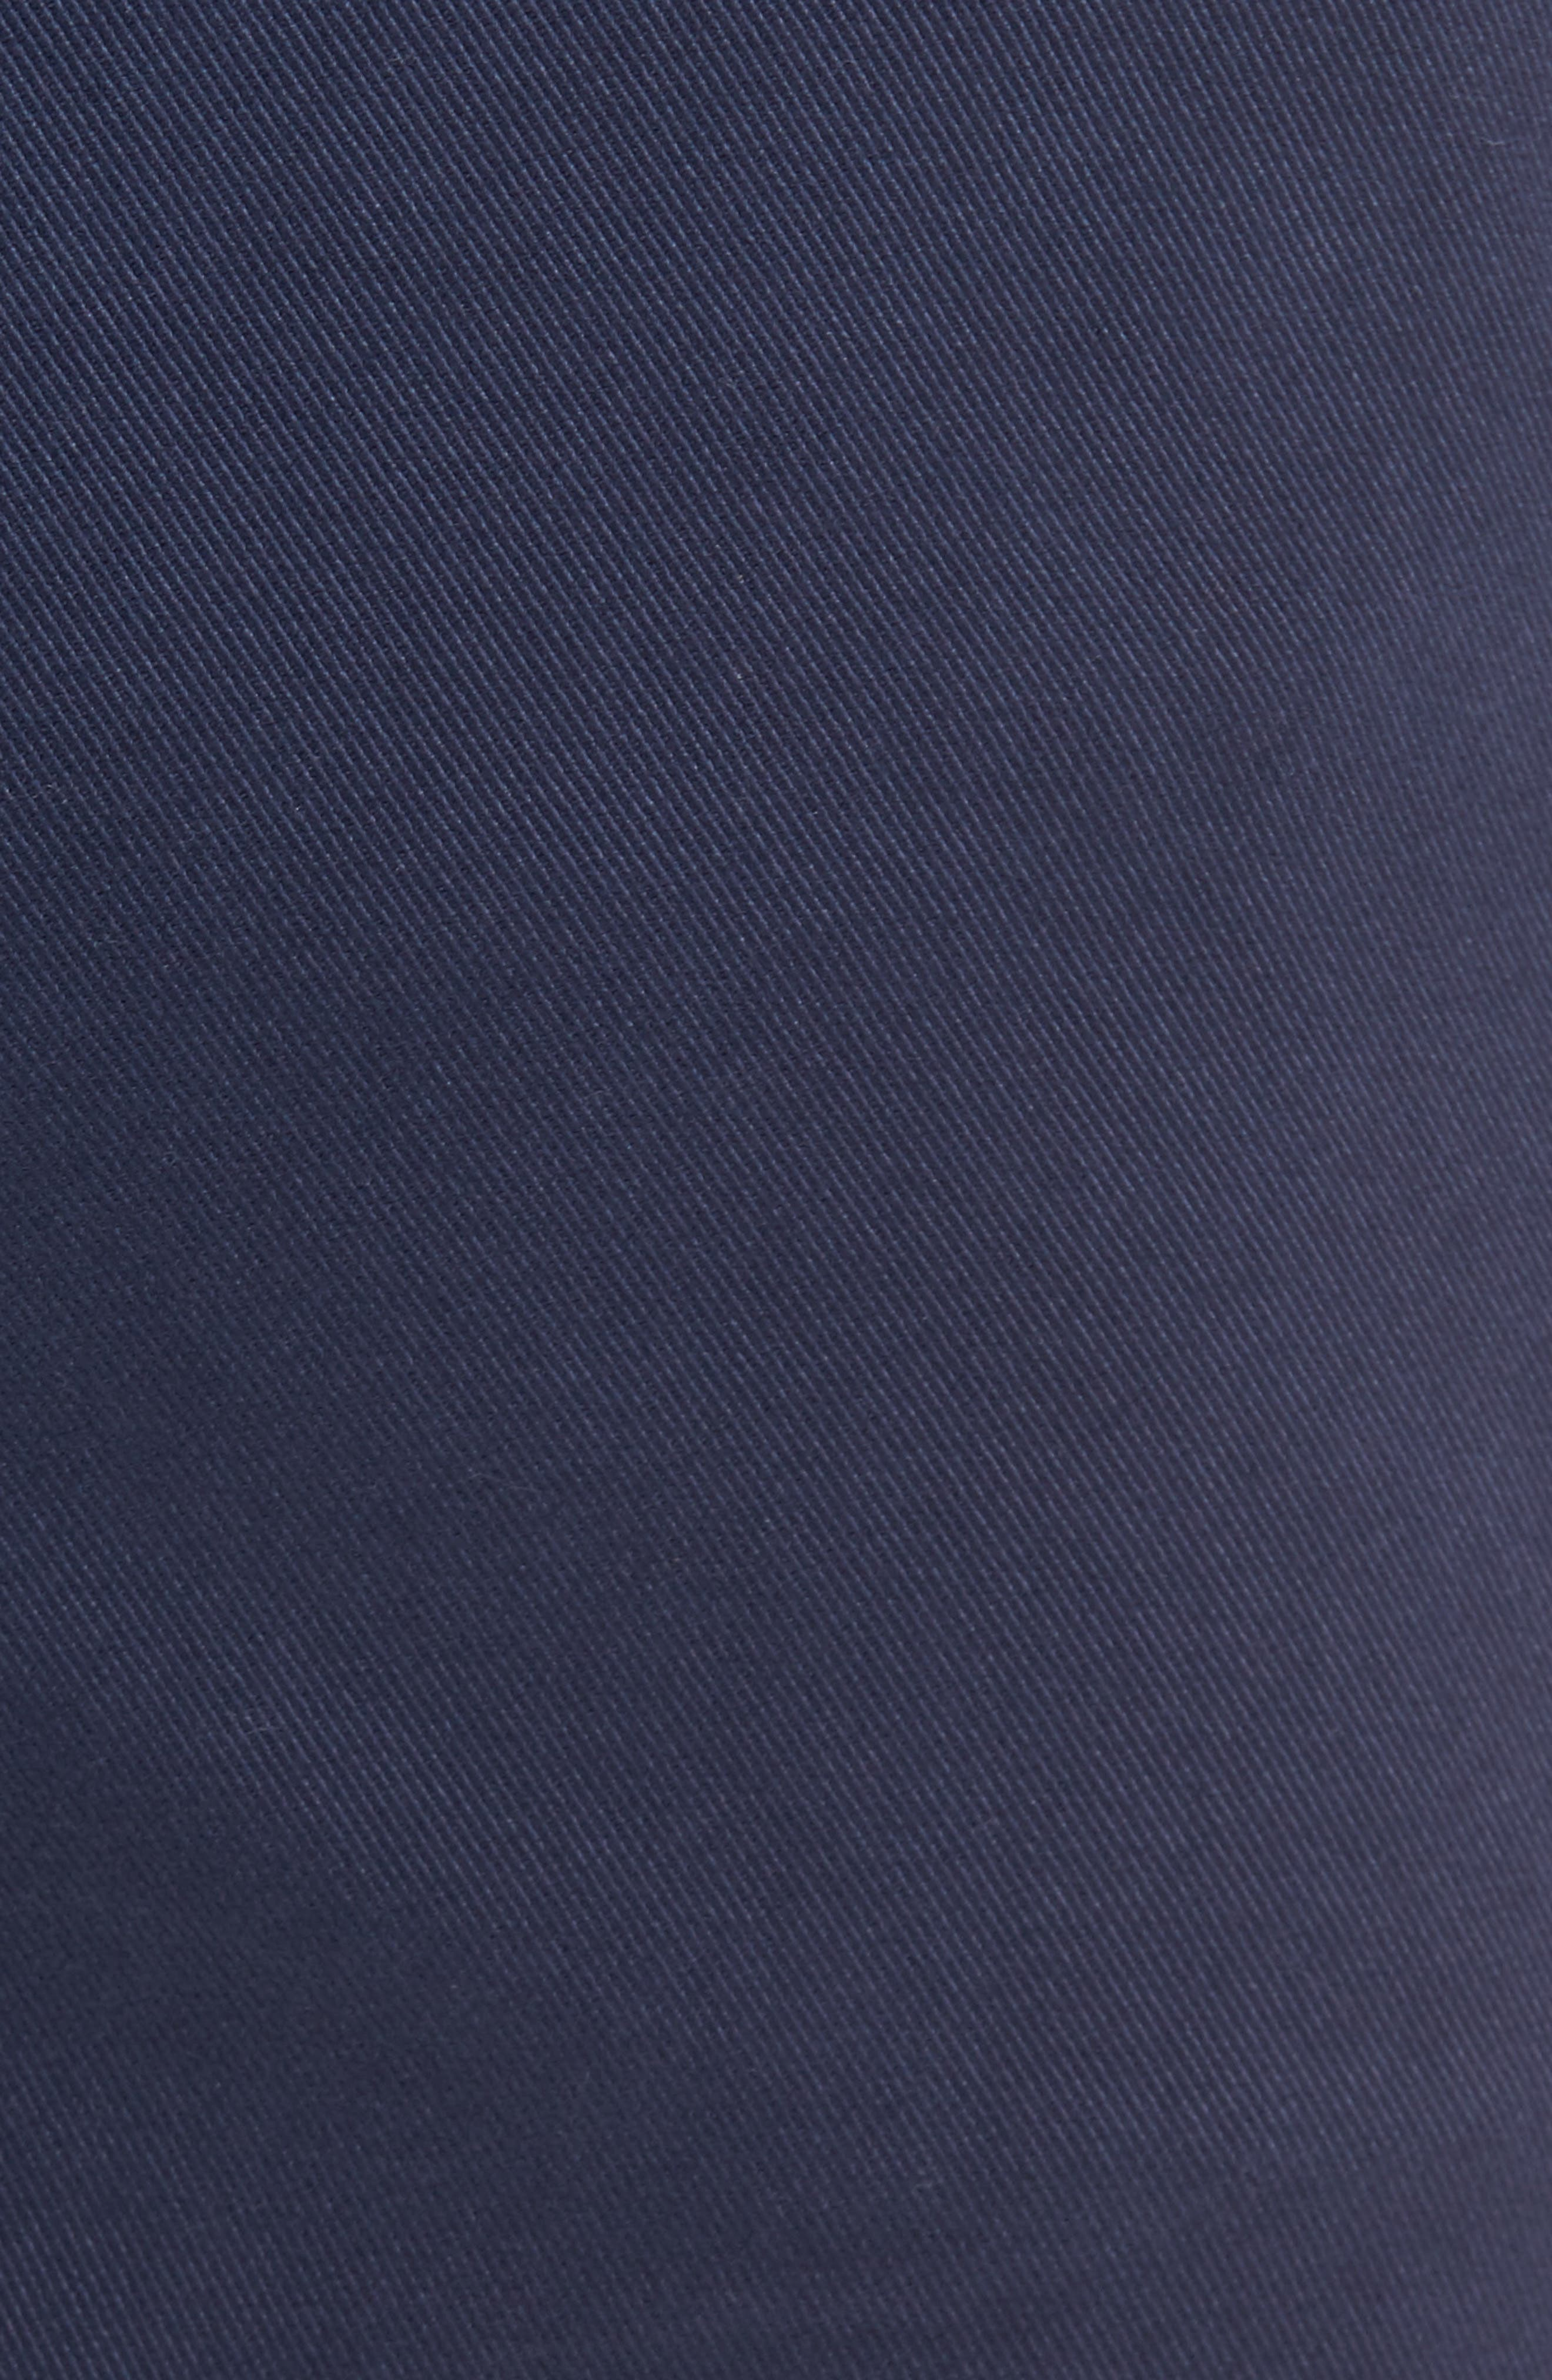 Kaito Stretch Chino Pants,                             Alternate thumbnail 5, color,                             Blue